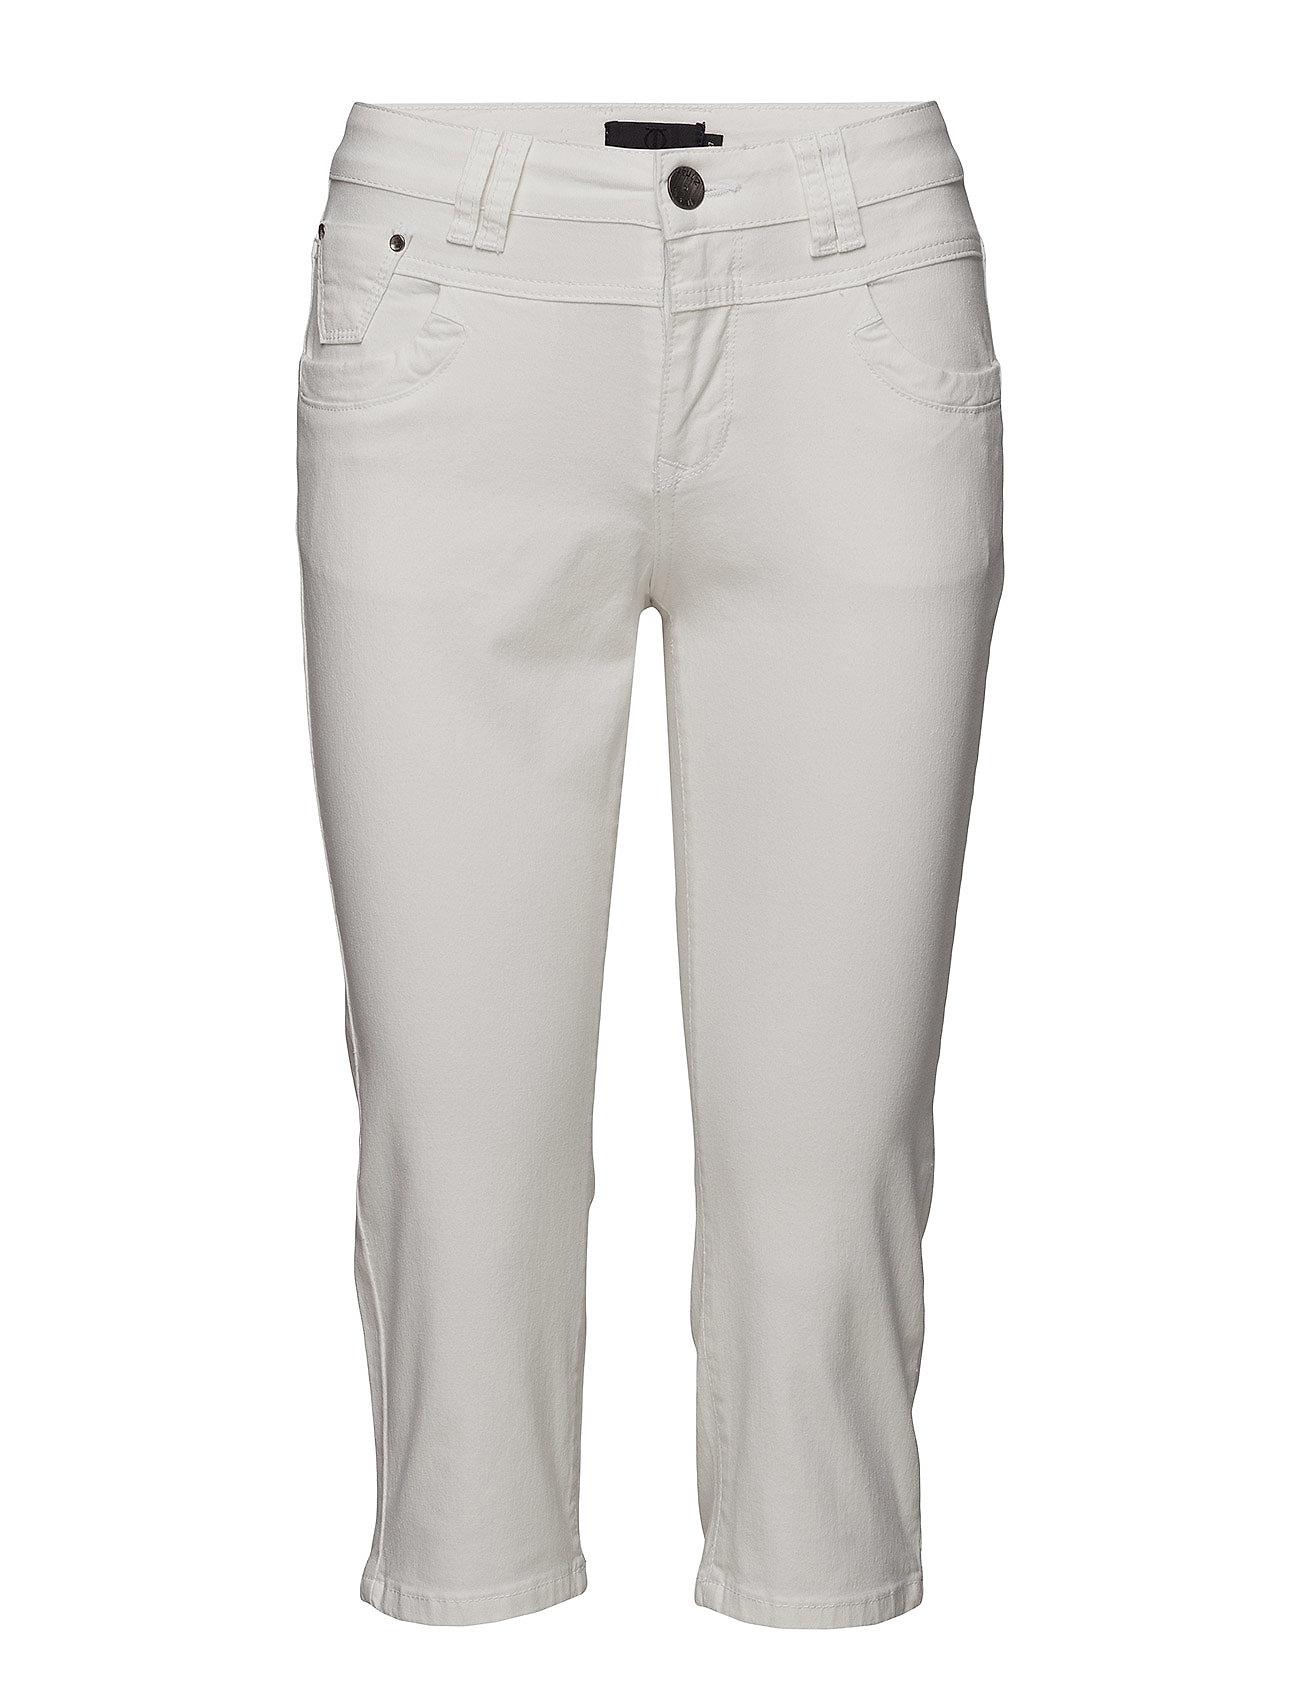 89b29b3fbf7 Tenna Highwaist Capri (White) (67.50 €) - Pulz Jeans - Jeans | Boozt.com